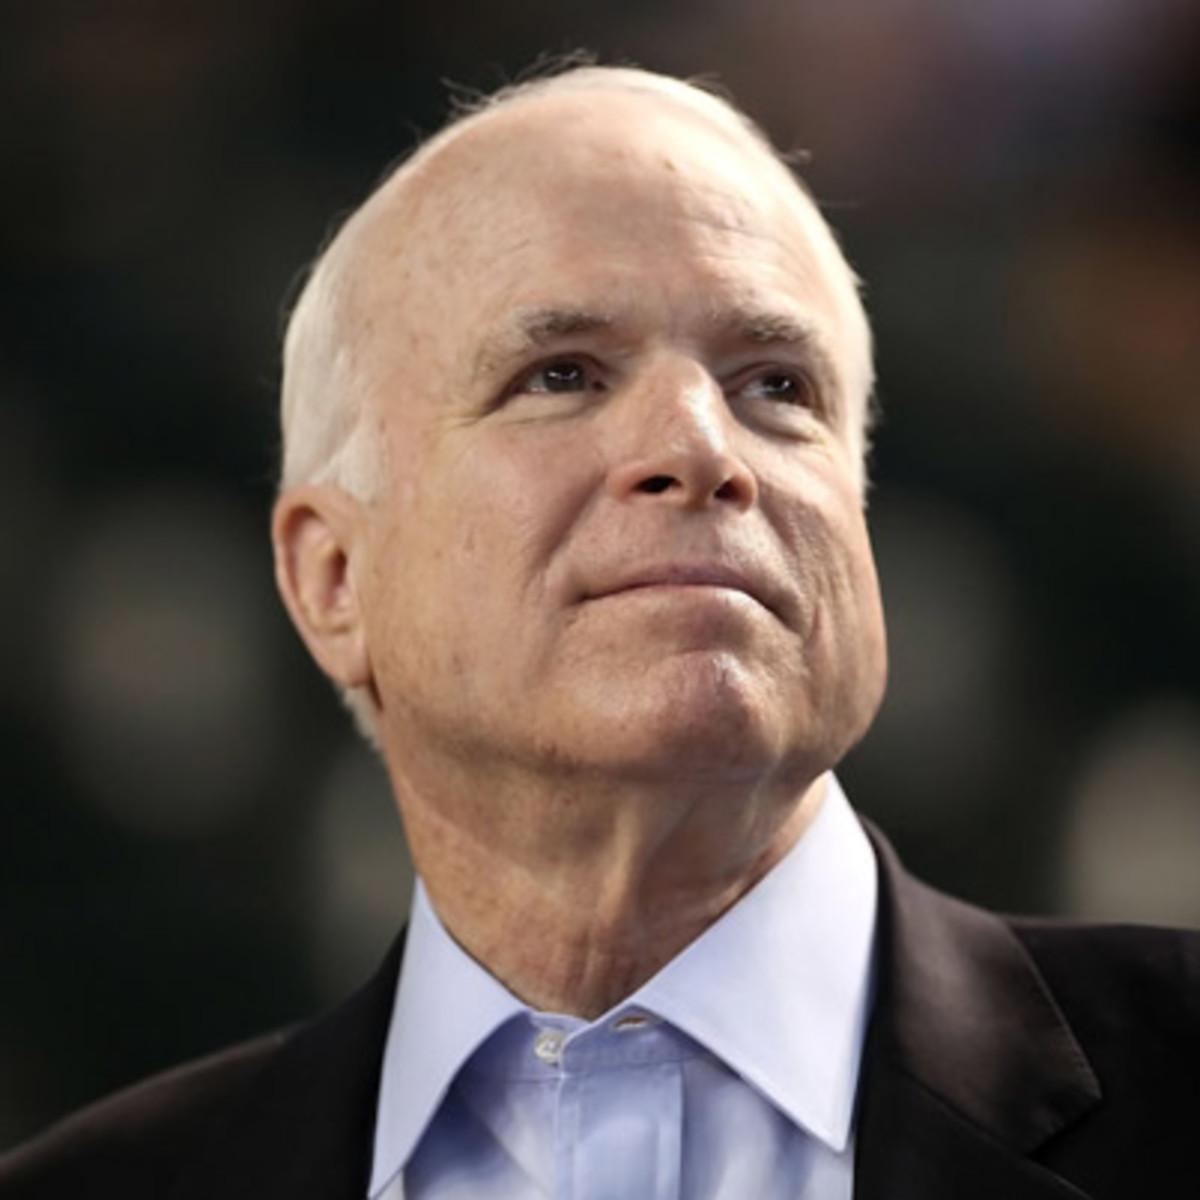 John McCain, Vietnam War Hero And Senator, Diagnosed With Malignant Brain Cancer [VIDEO]